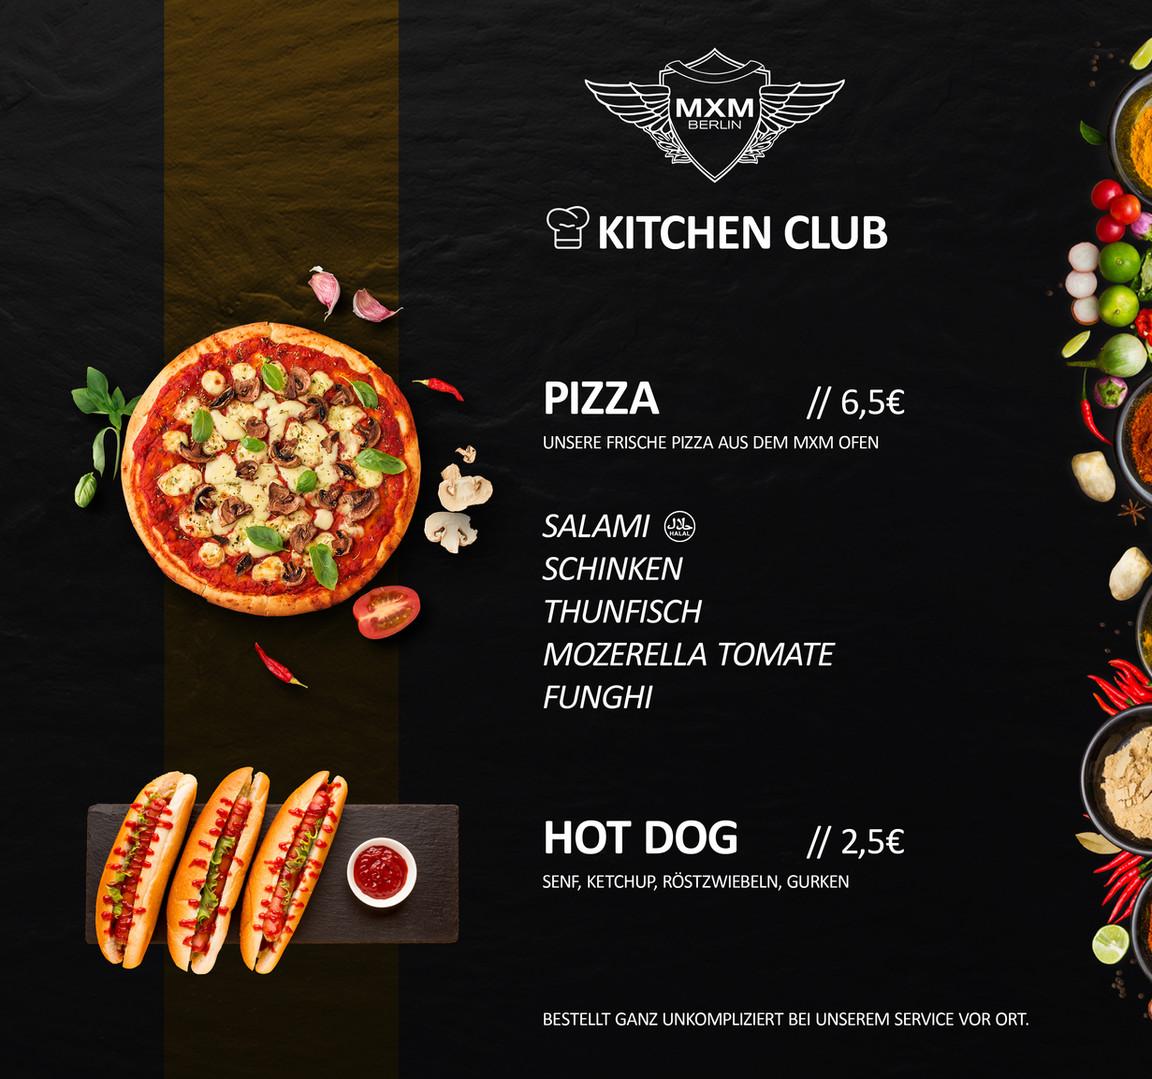 KitchenClub.jpg